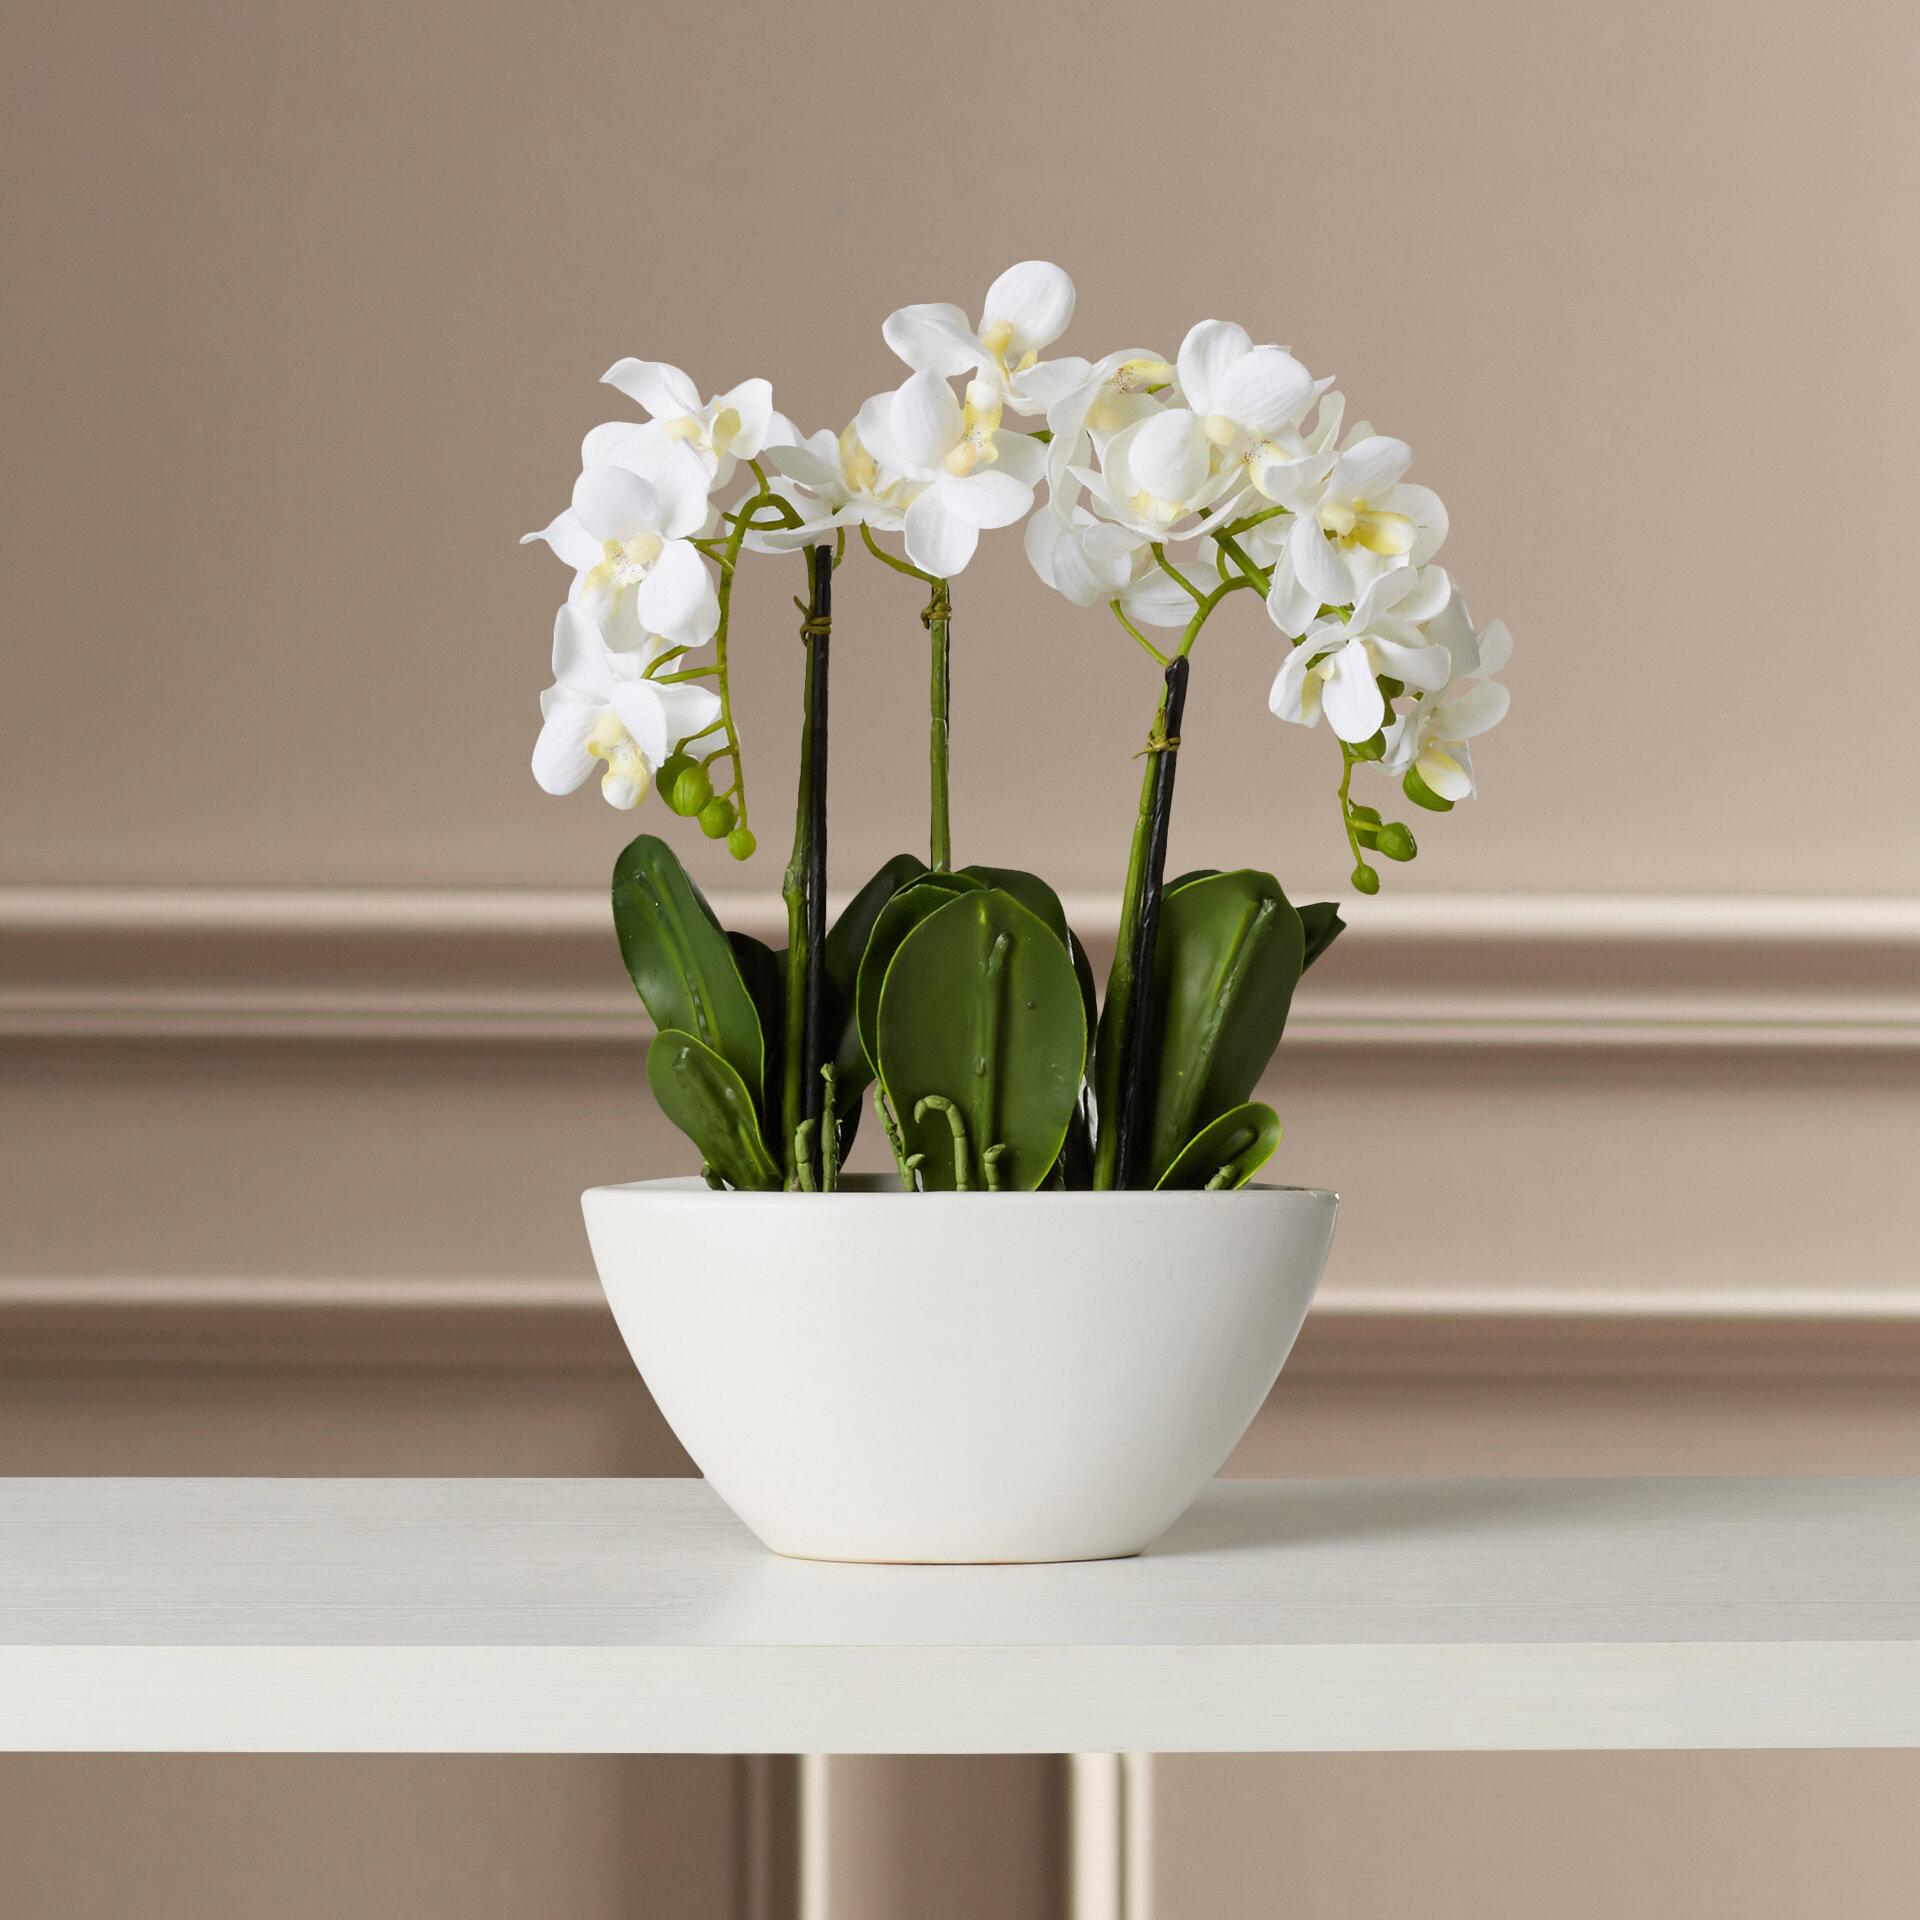 Willa Arlo Interiors Phalaenopsis Silk Flowers In Pot Reviews